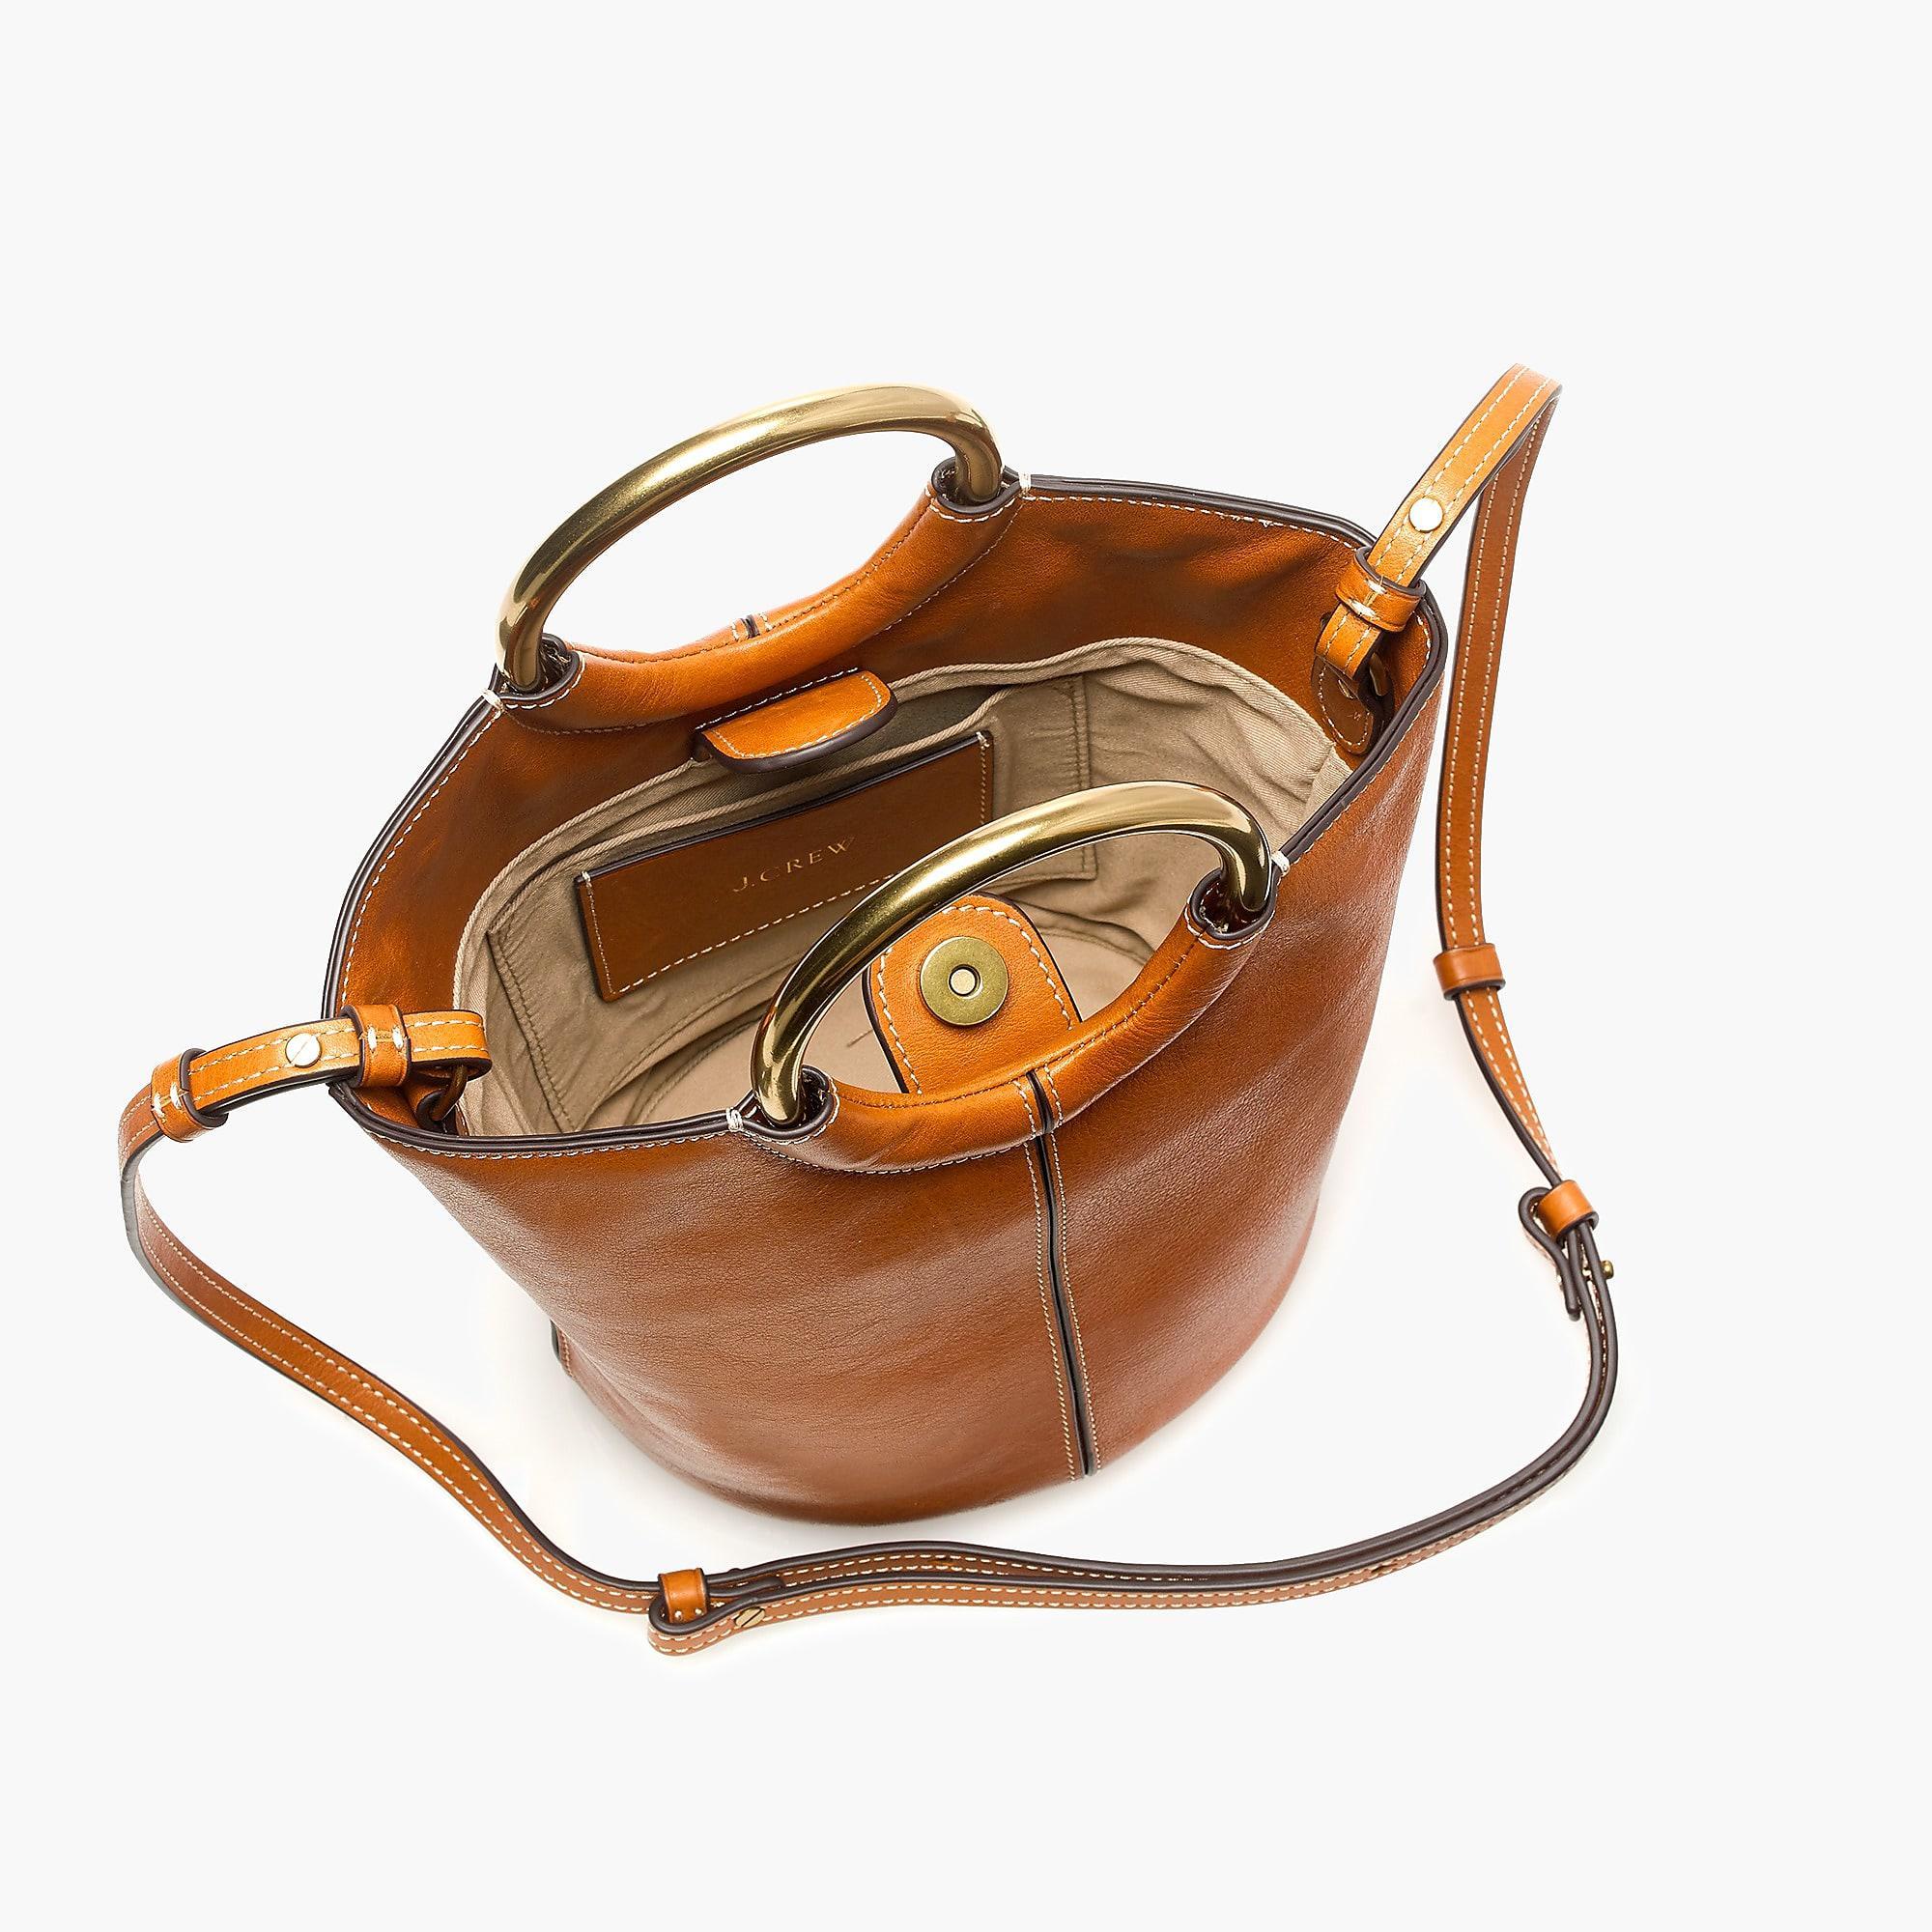 fd76607844f5 J.Crew Bracelet Bucket Bag In Italian Leather in Brown - Save 11% - Lyst